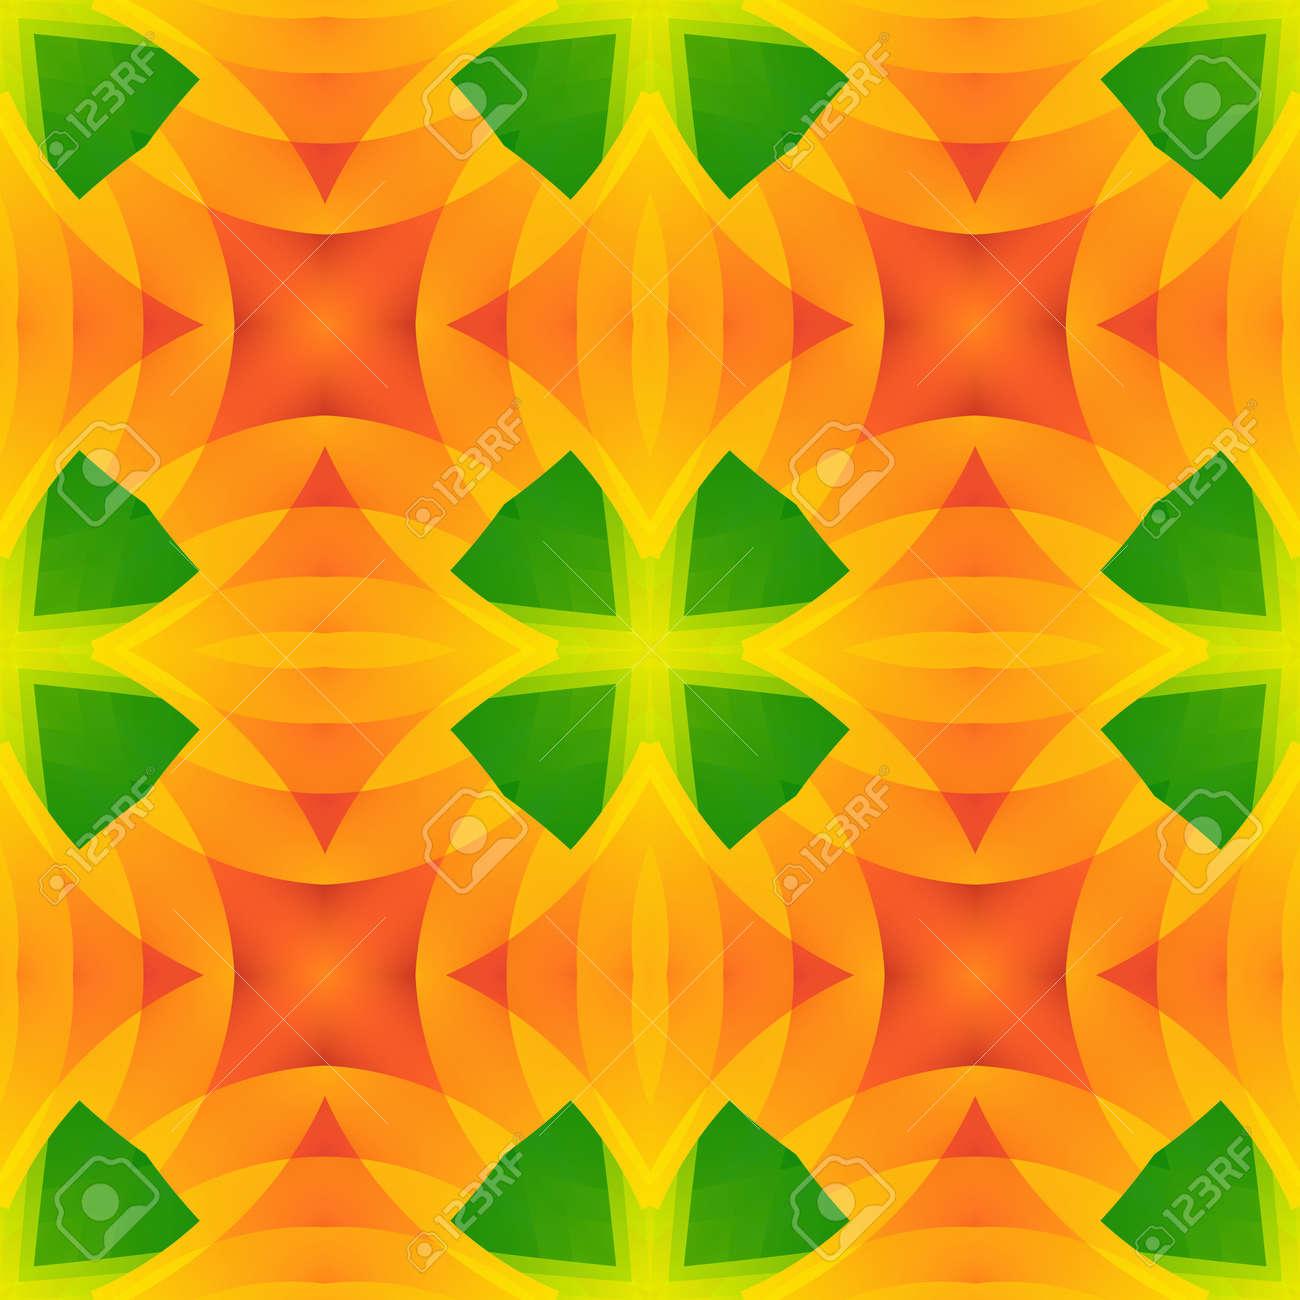 Vivid Green Orange Abstract Texture. Seamless Tile. Home Decor Fabric  Design Sample. Detailed